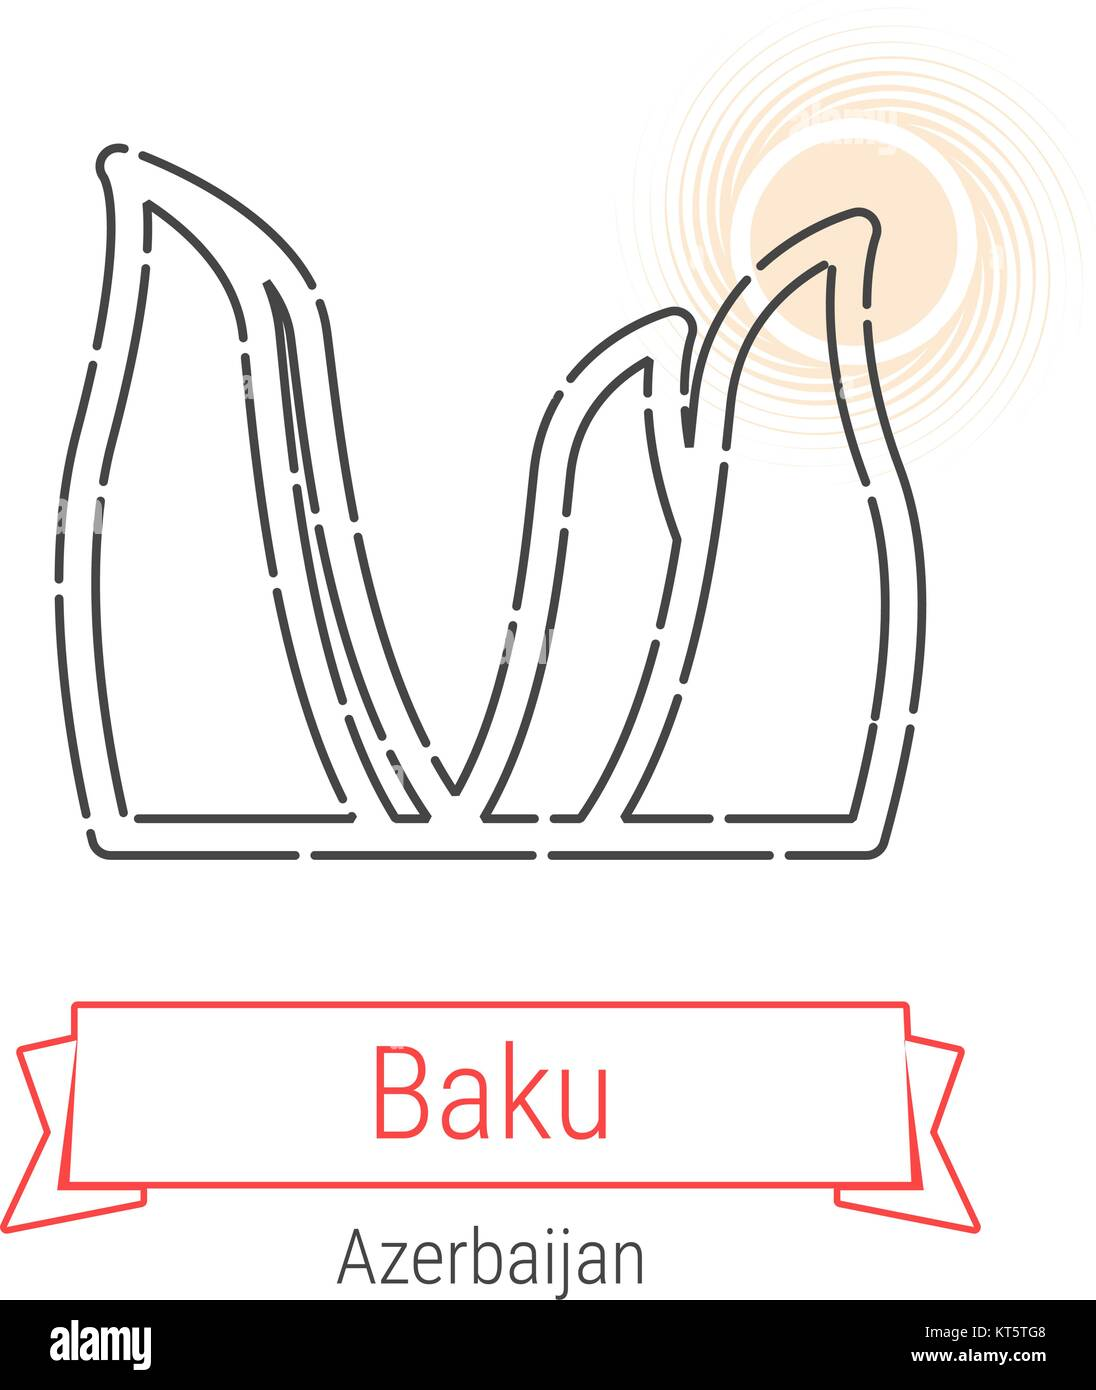 Baku, Azerbaijan Vector Line Icon with Red Ribbon Isolated on White. Baku Landmark - Emblem - Print - Label - Symbol. - Stock Vector